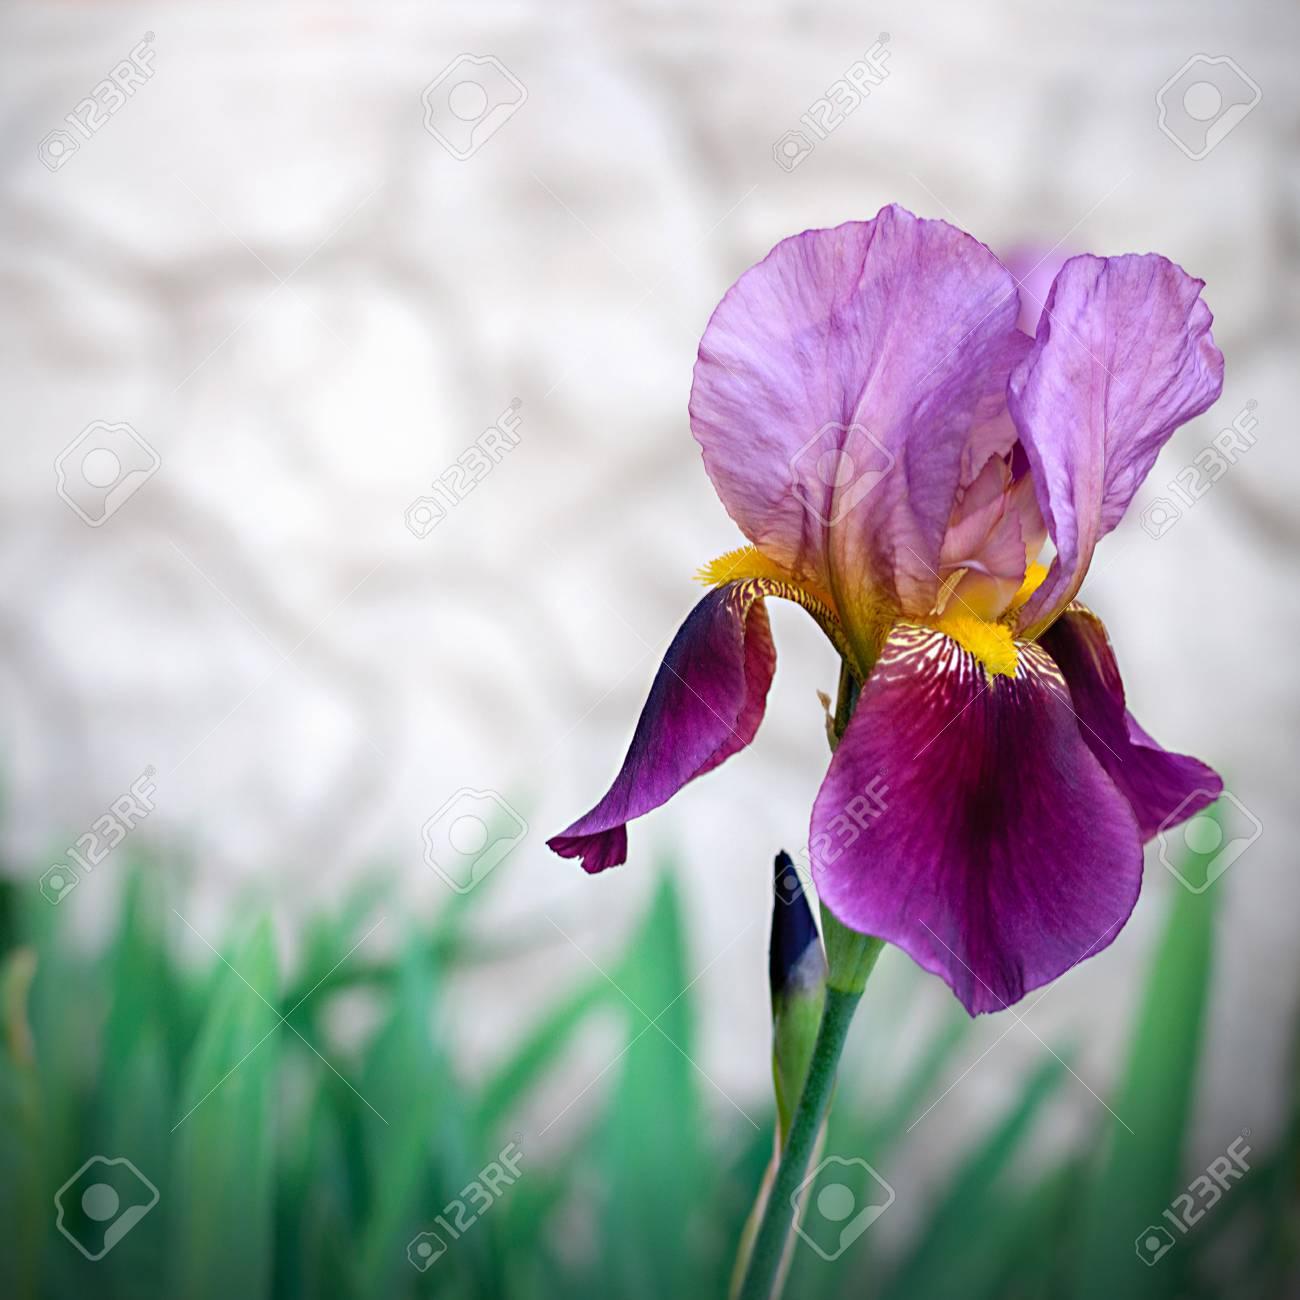 Close up of iris flowers stock photo picture and royalty free image close up of iris flowers stock photo 41374735 izmirmasajfo